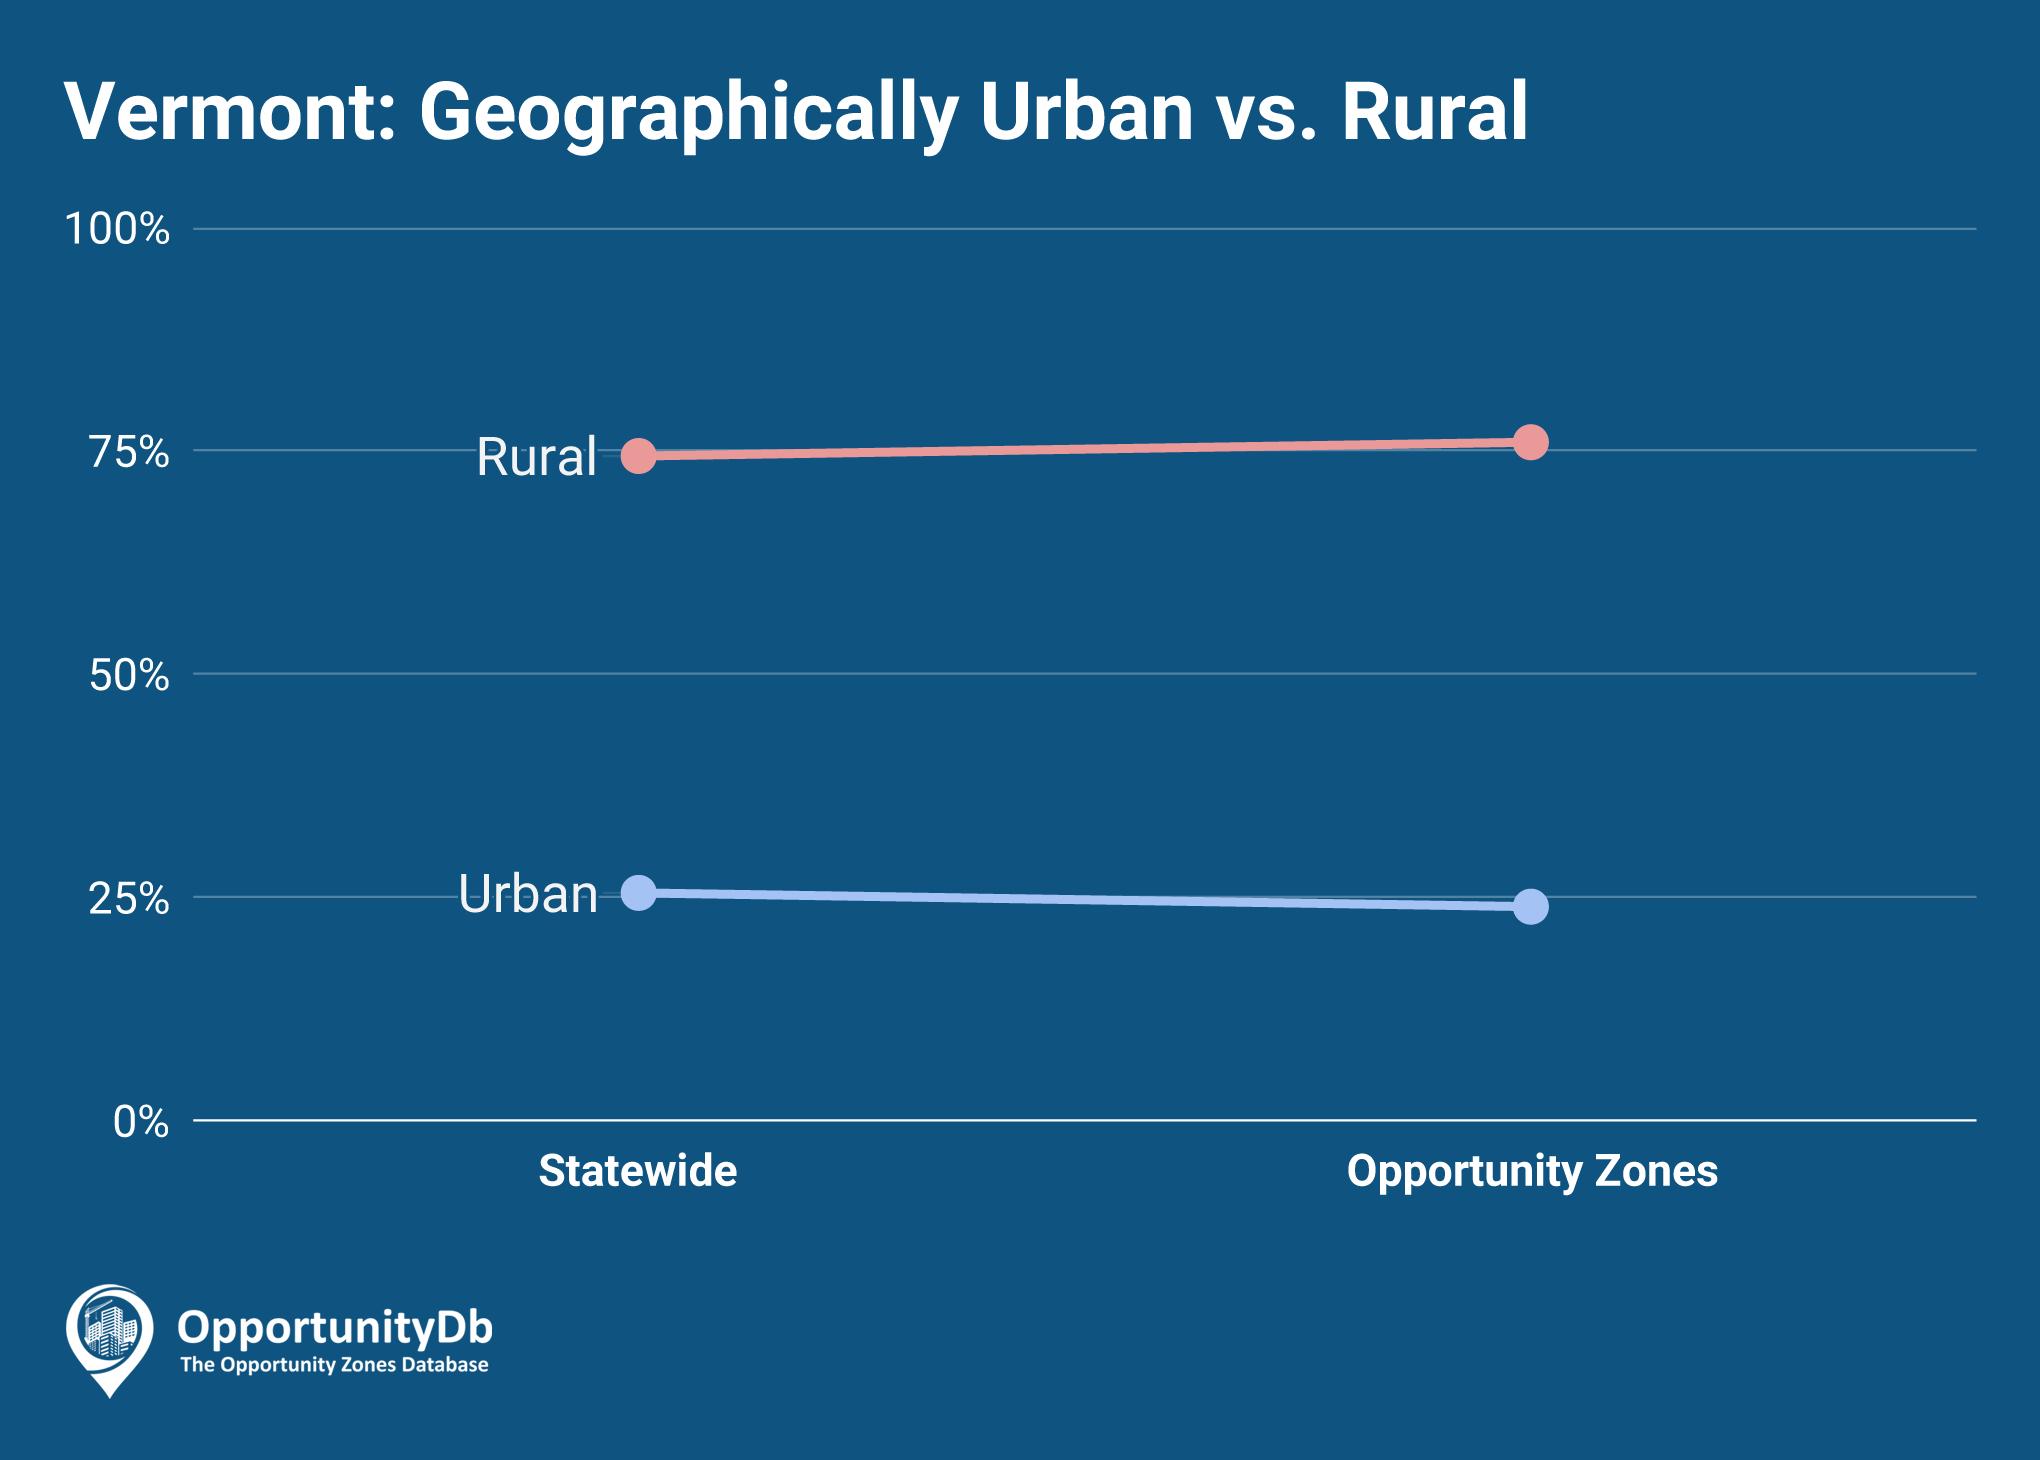 Urban vs. Rural in Vermont Opportunity Zones